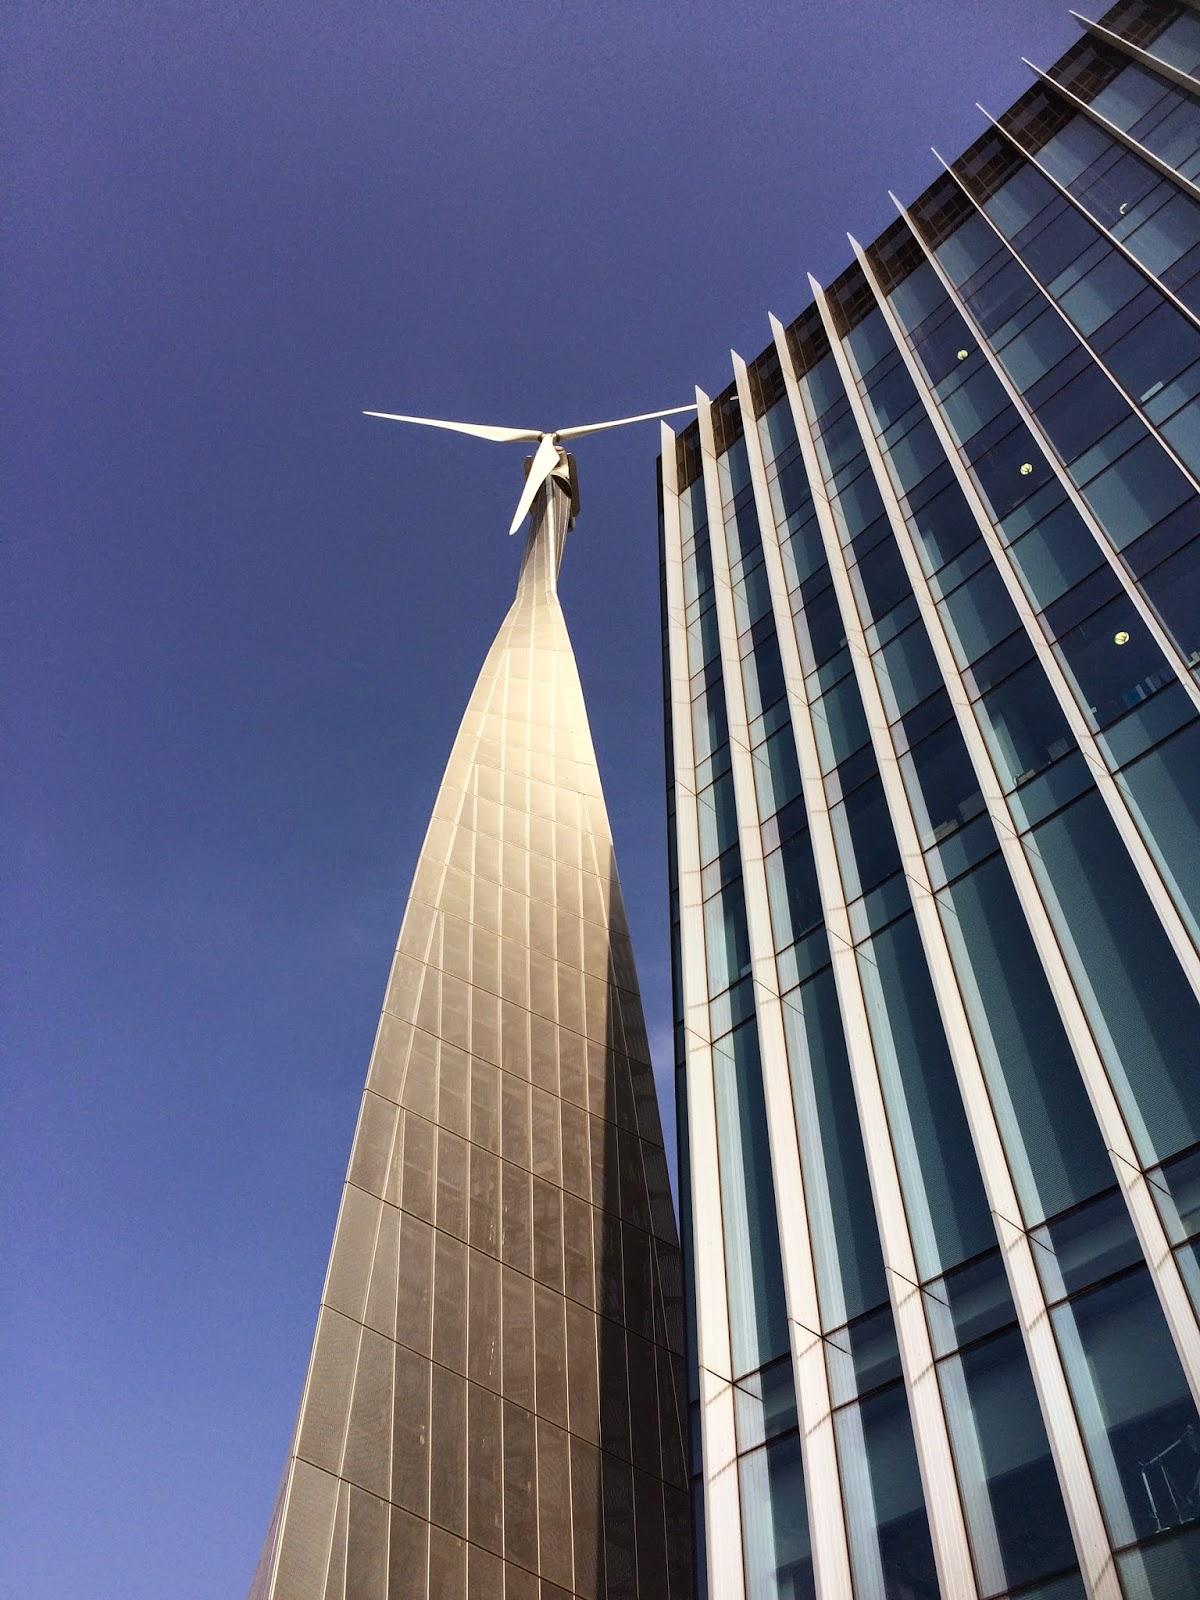 wind turbine at Sky TV